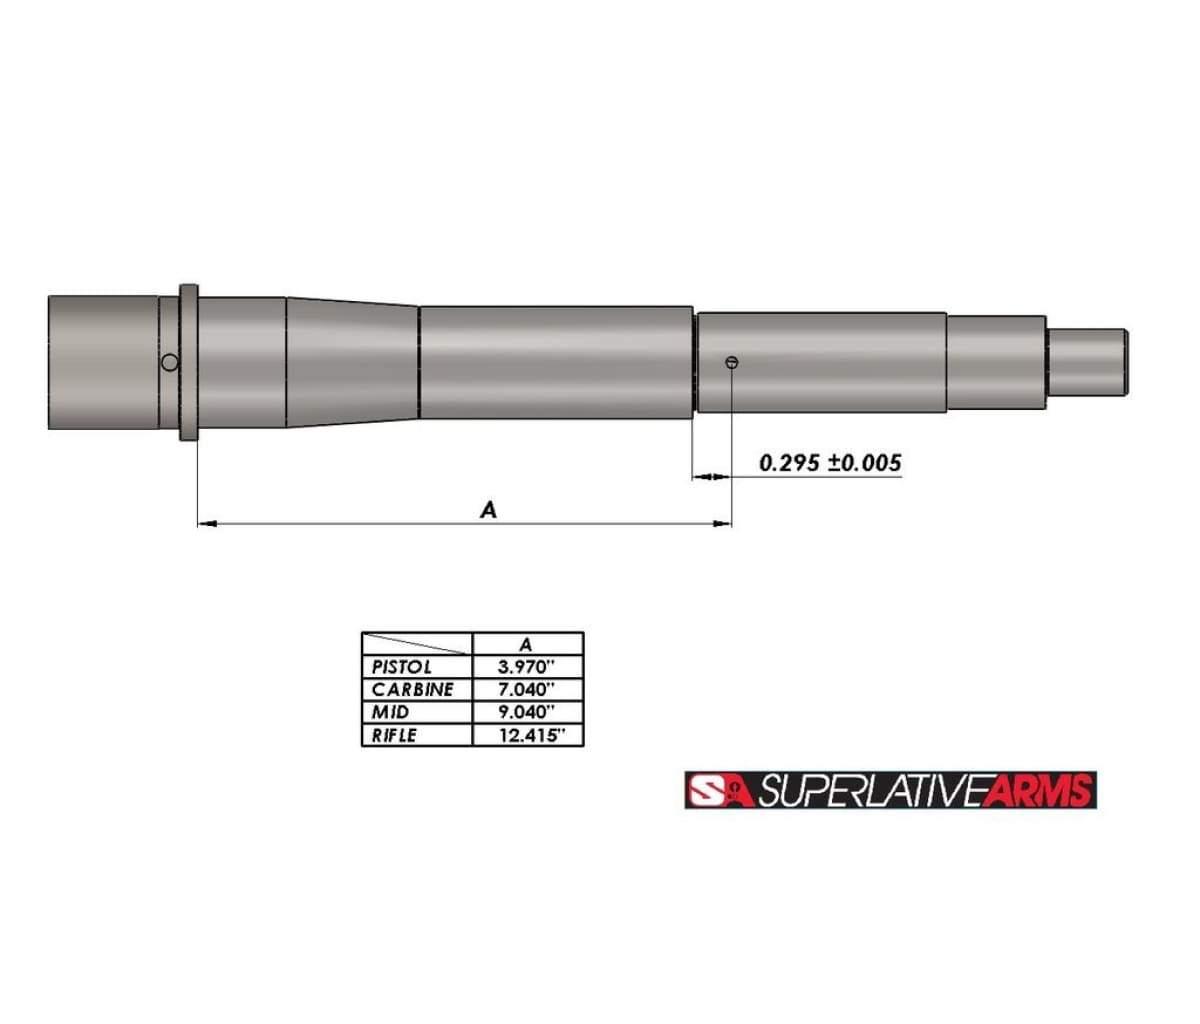 Superlative Arms 625 Adjustable Piston System